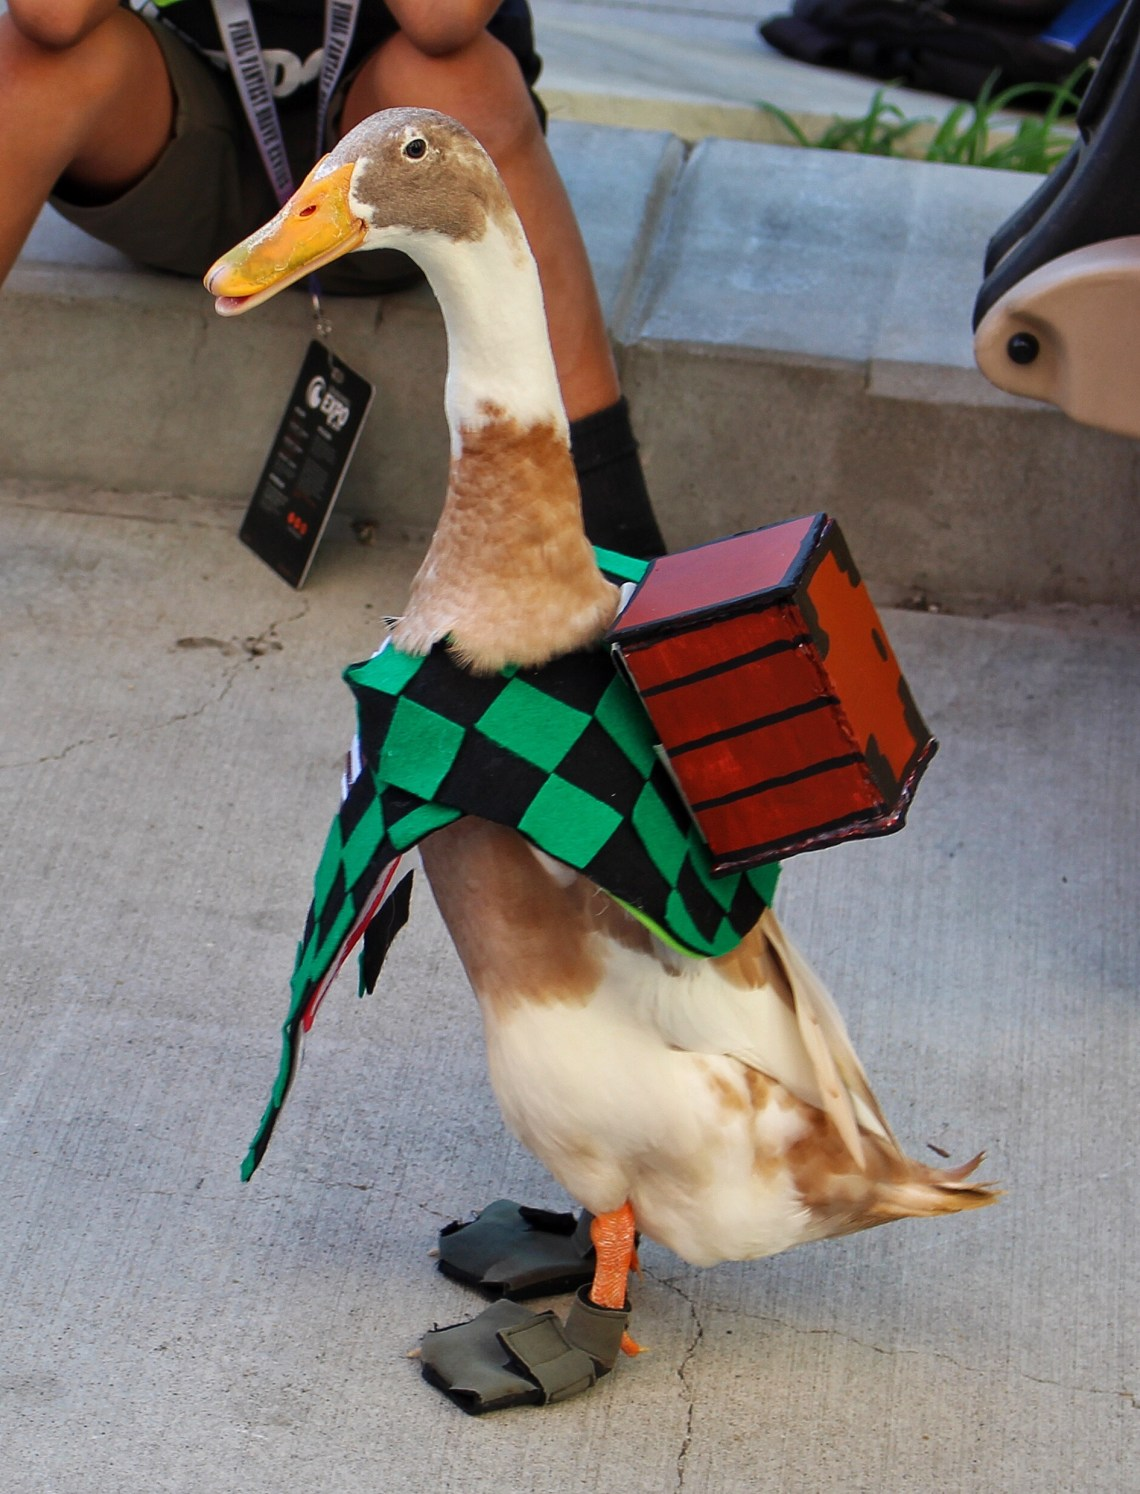 Tito the duck coplay Tanjiro Kamado Cruncyroll Expo 2019 8Bit/Digi